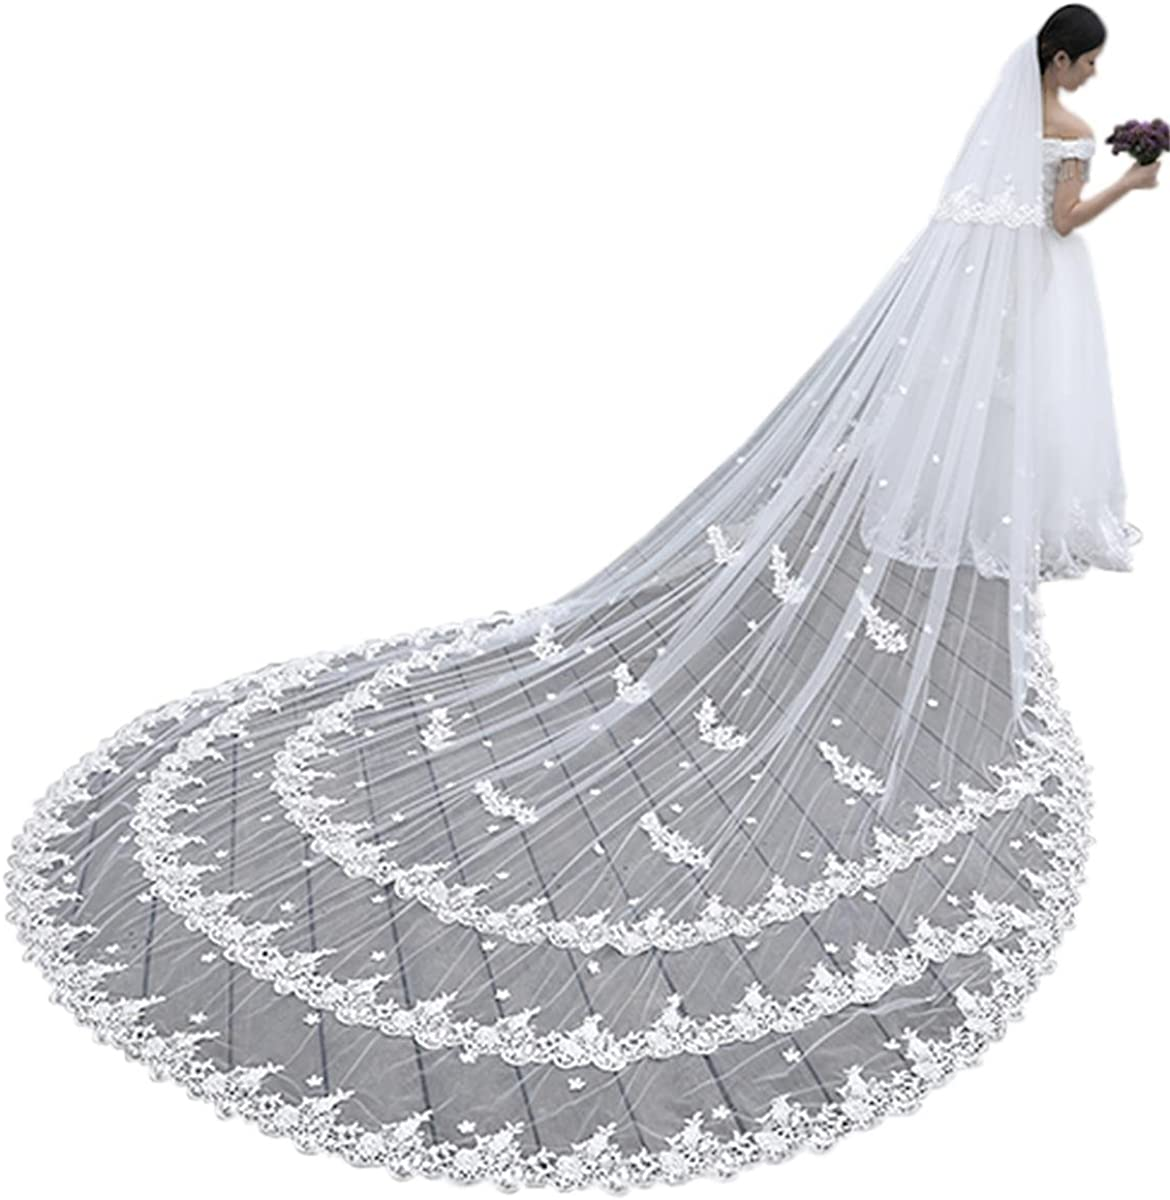 Wedding Bridal Veil 4M 2T Lace Applique Edge Long With Free Comb